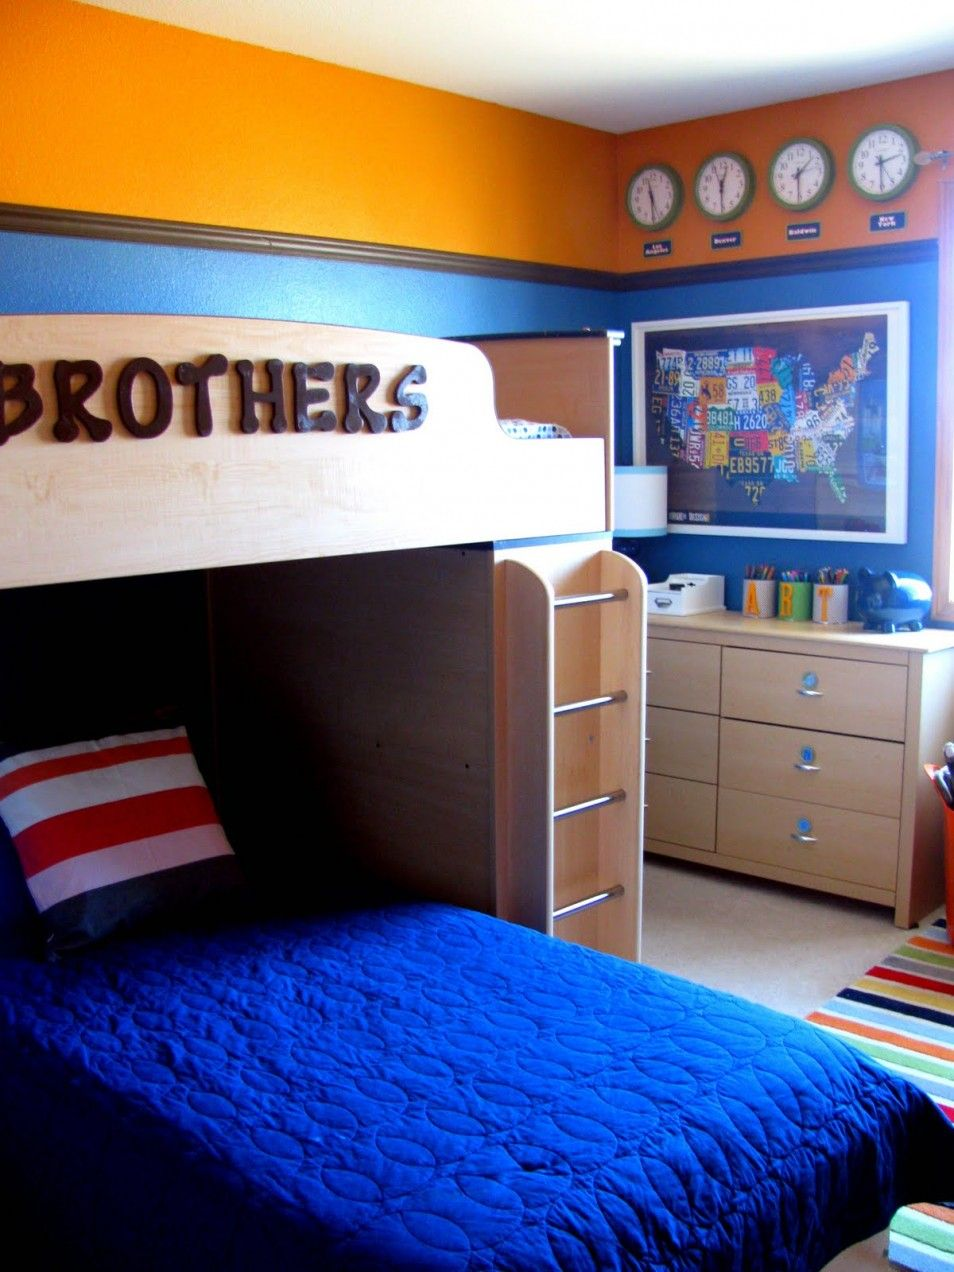 beautiful Boy Decorating Room Ideas Part - 13: Wonderful Boys Decorating Design For Boys Bedroom Ideas At Home Boys Bedroom  Colors Ideas Decorating Ideas For Bedroom Kid Bedroom Organization Ideas ...